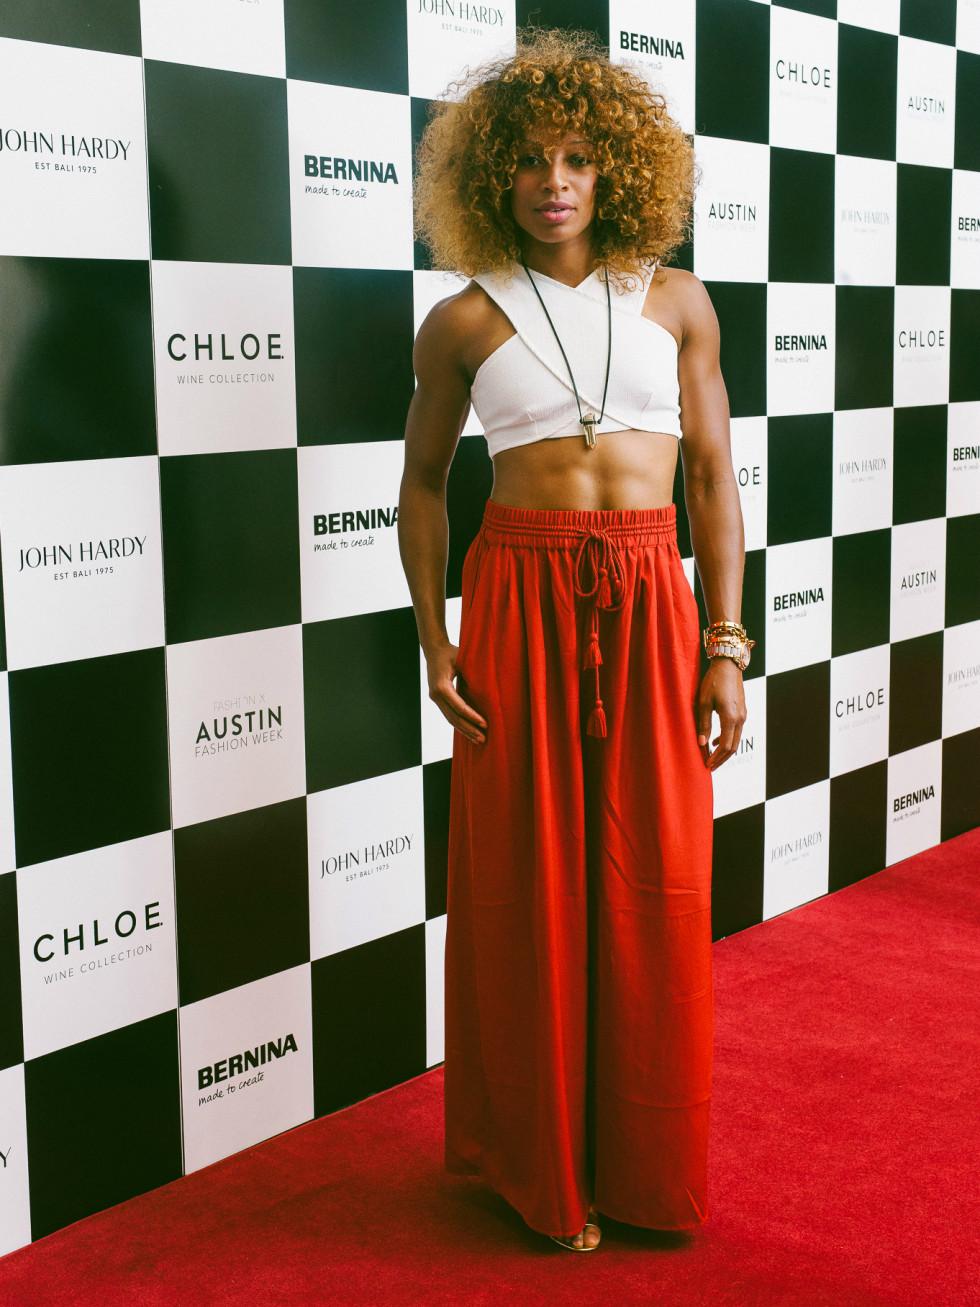 Austin Fashion Week 2016 red carpet Natasha Hastings